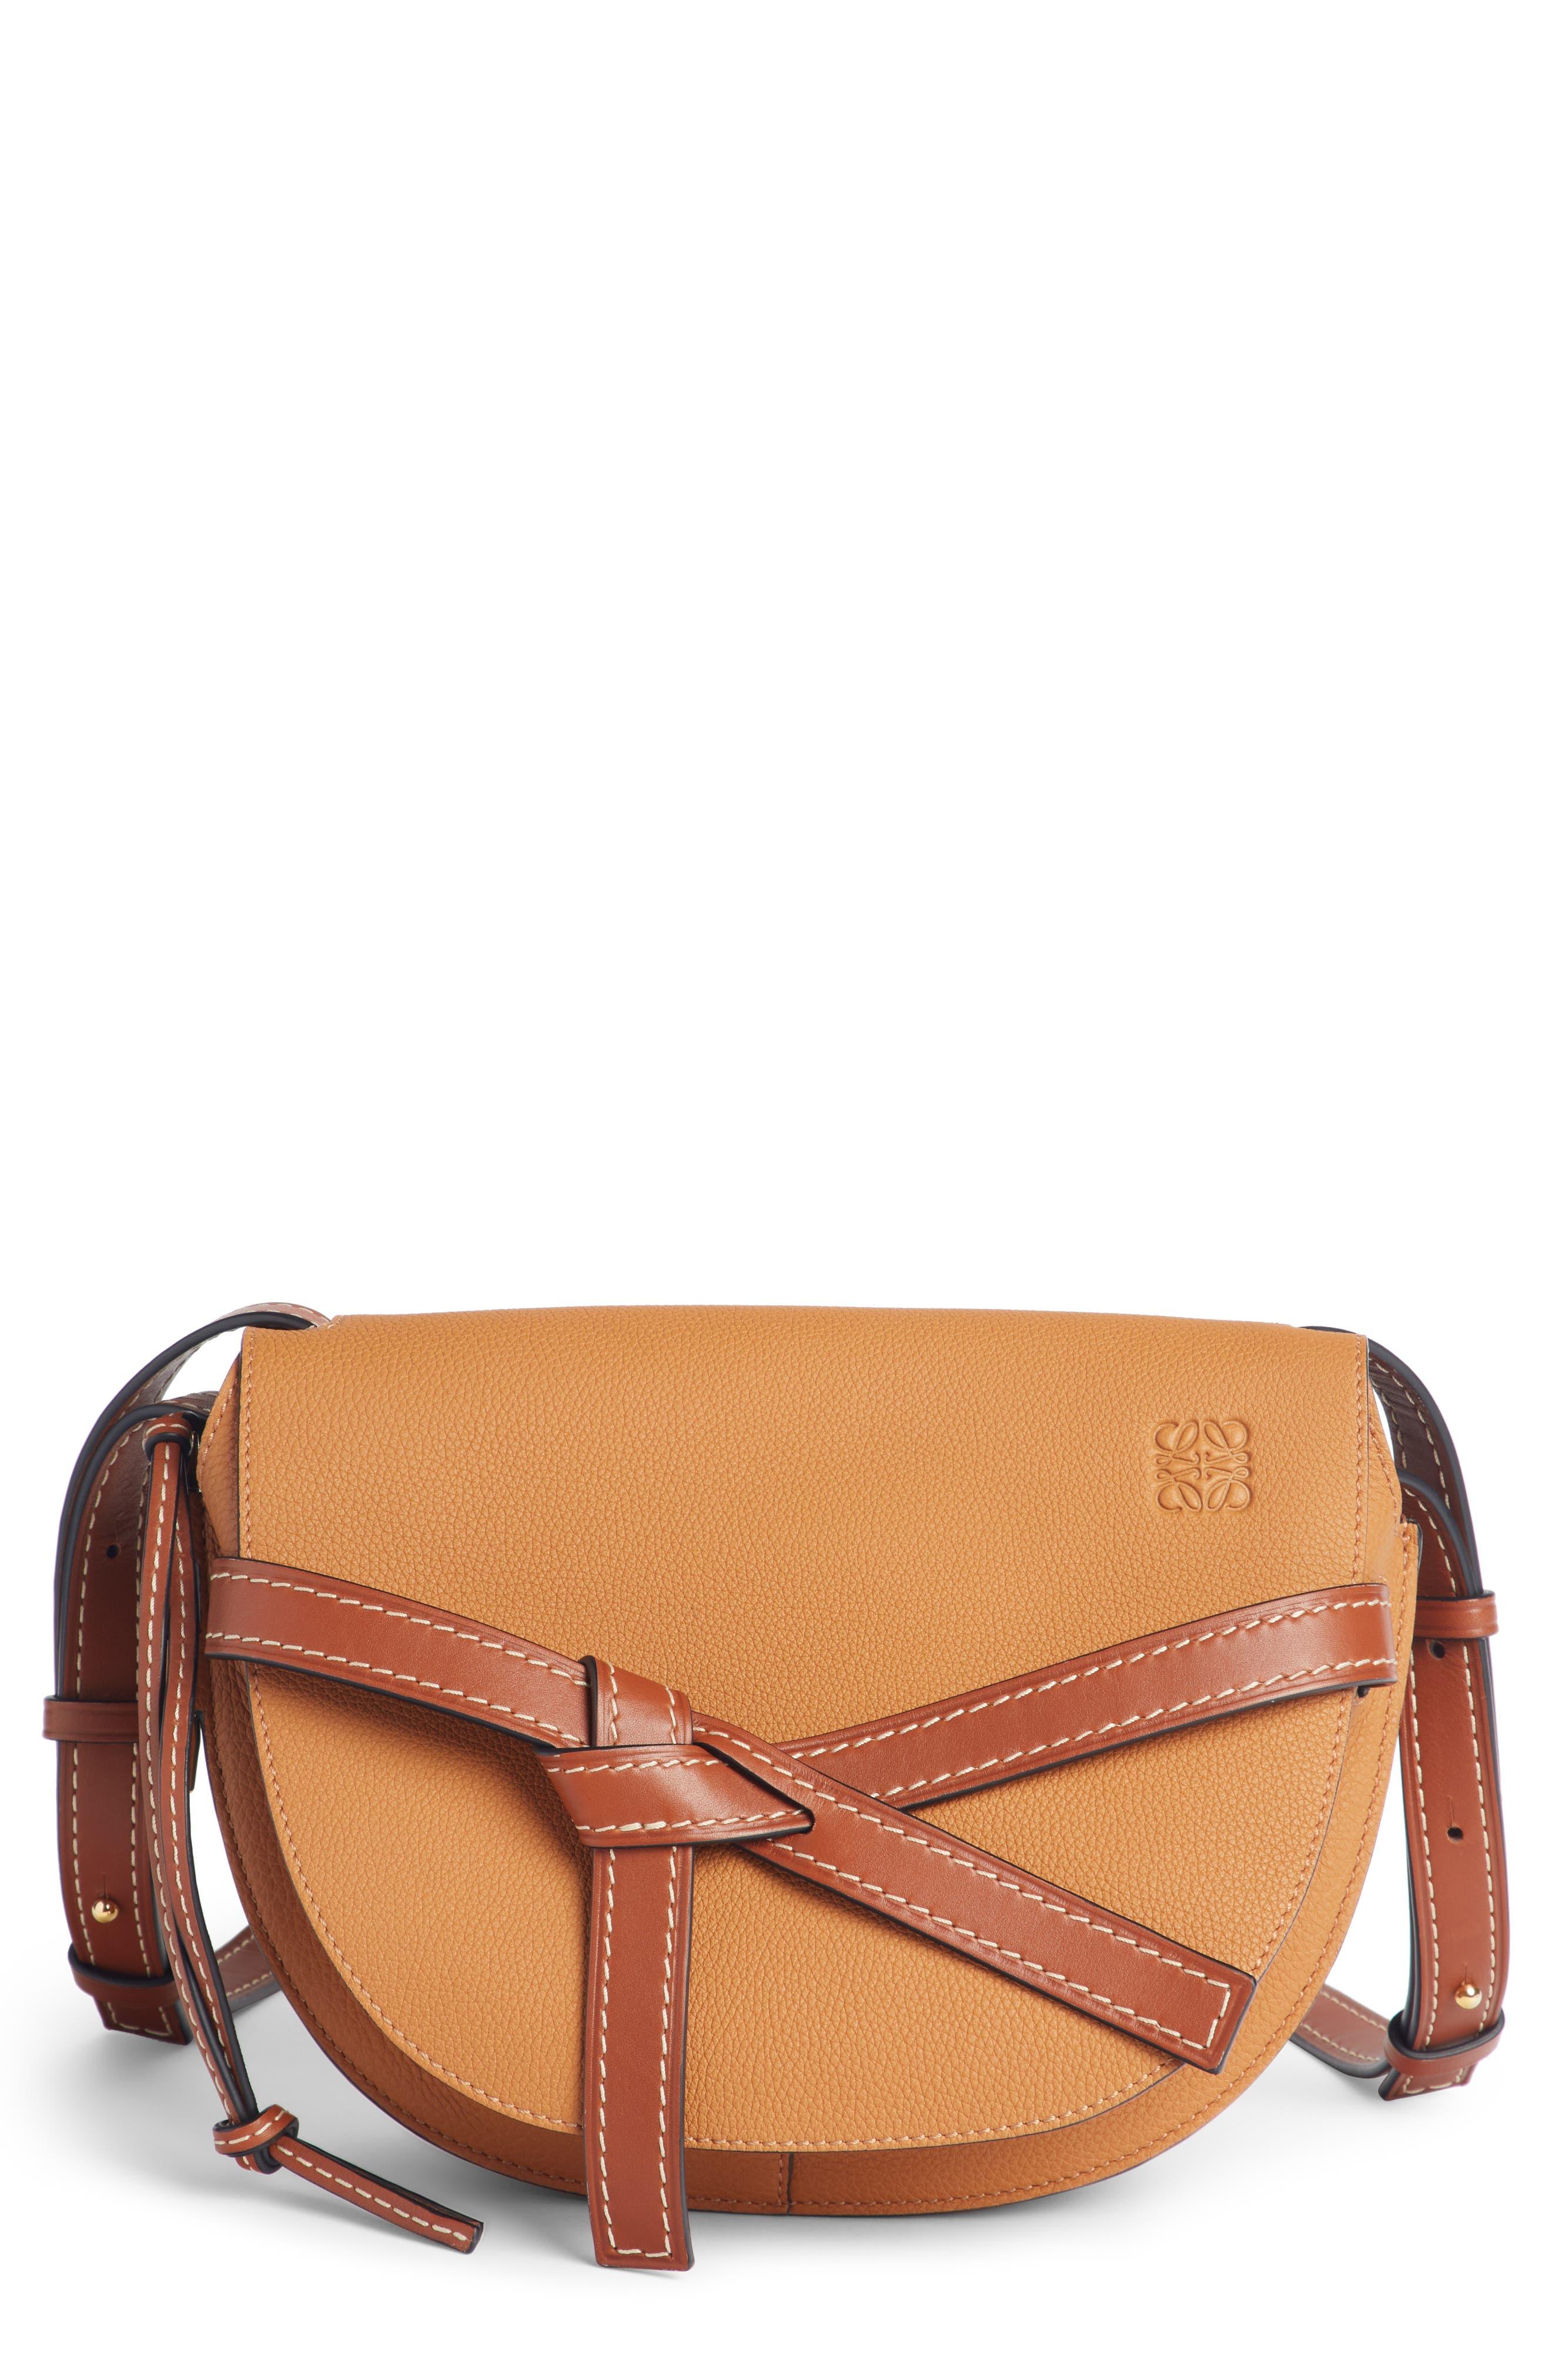 LOEWE,                             Small Gate Leather Crossbody Bag,                             Main thumbnail 1, color,                             LIGHT CARAMEL/ PECAN